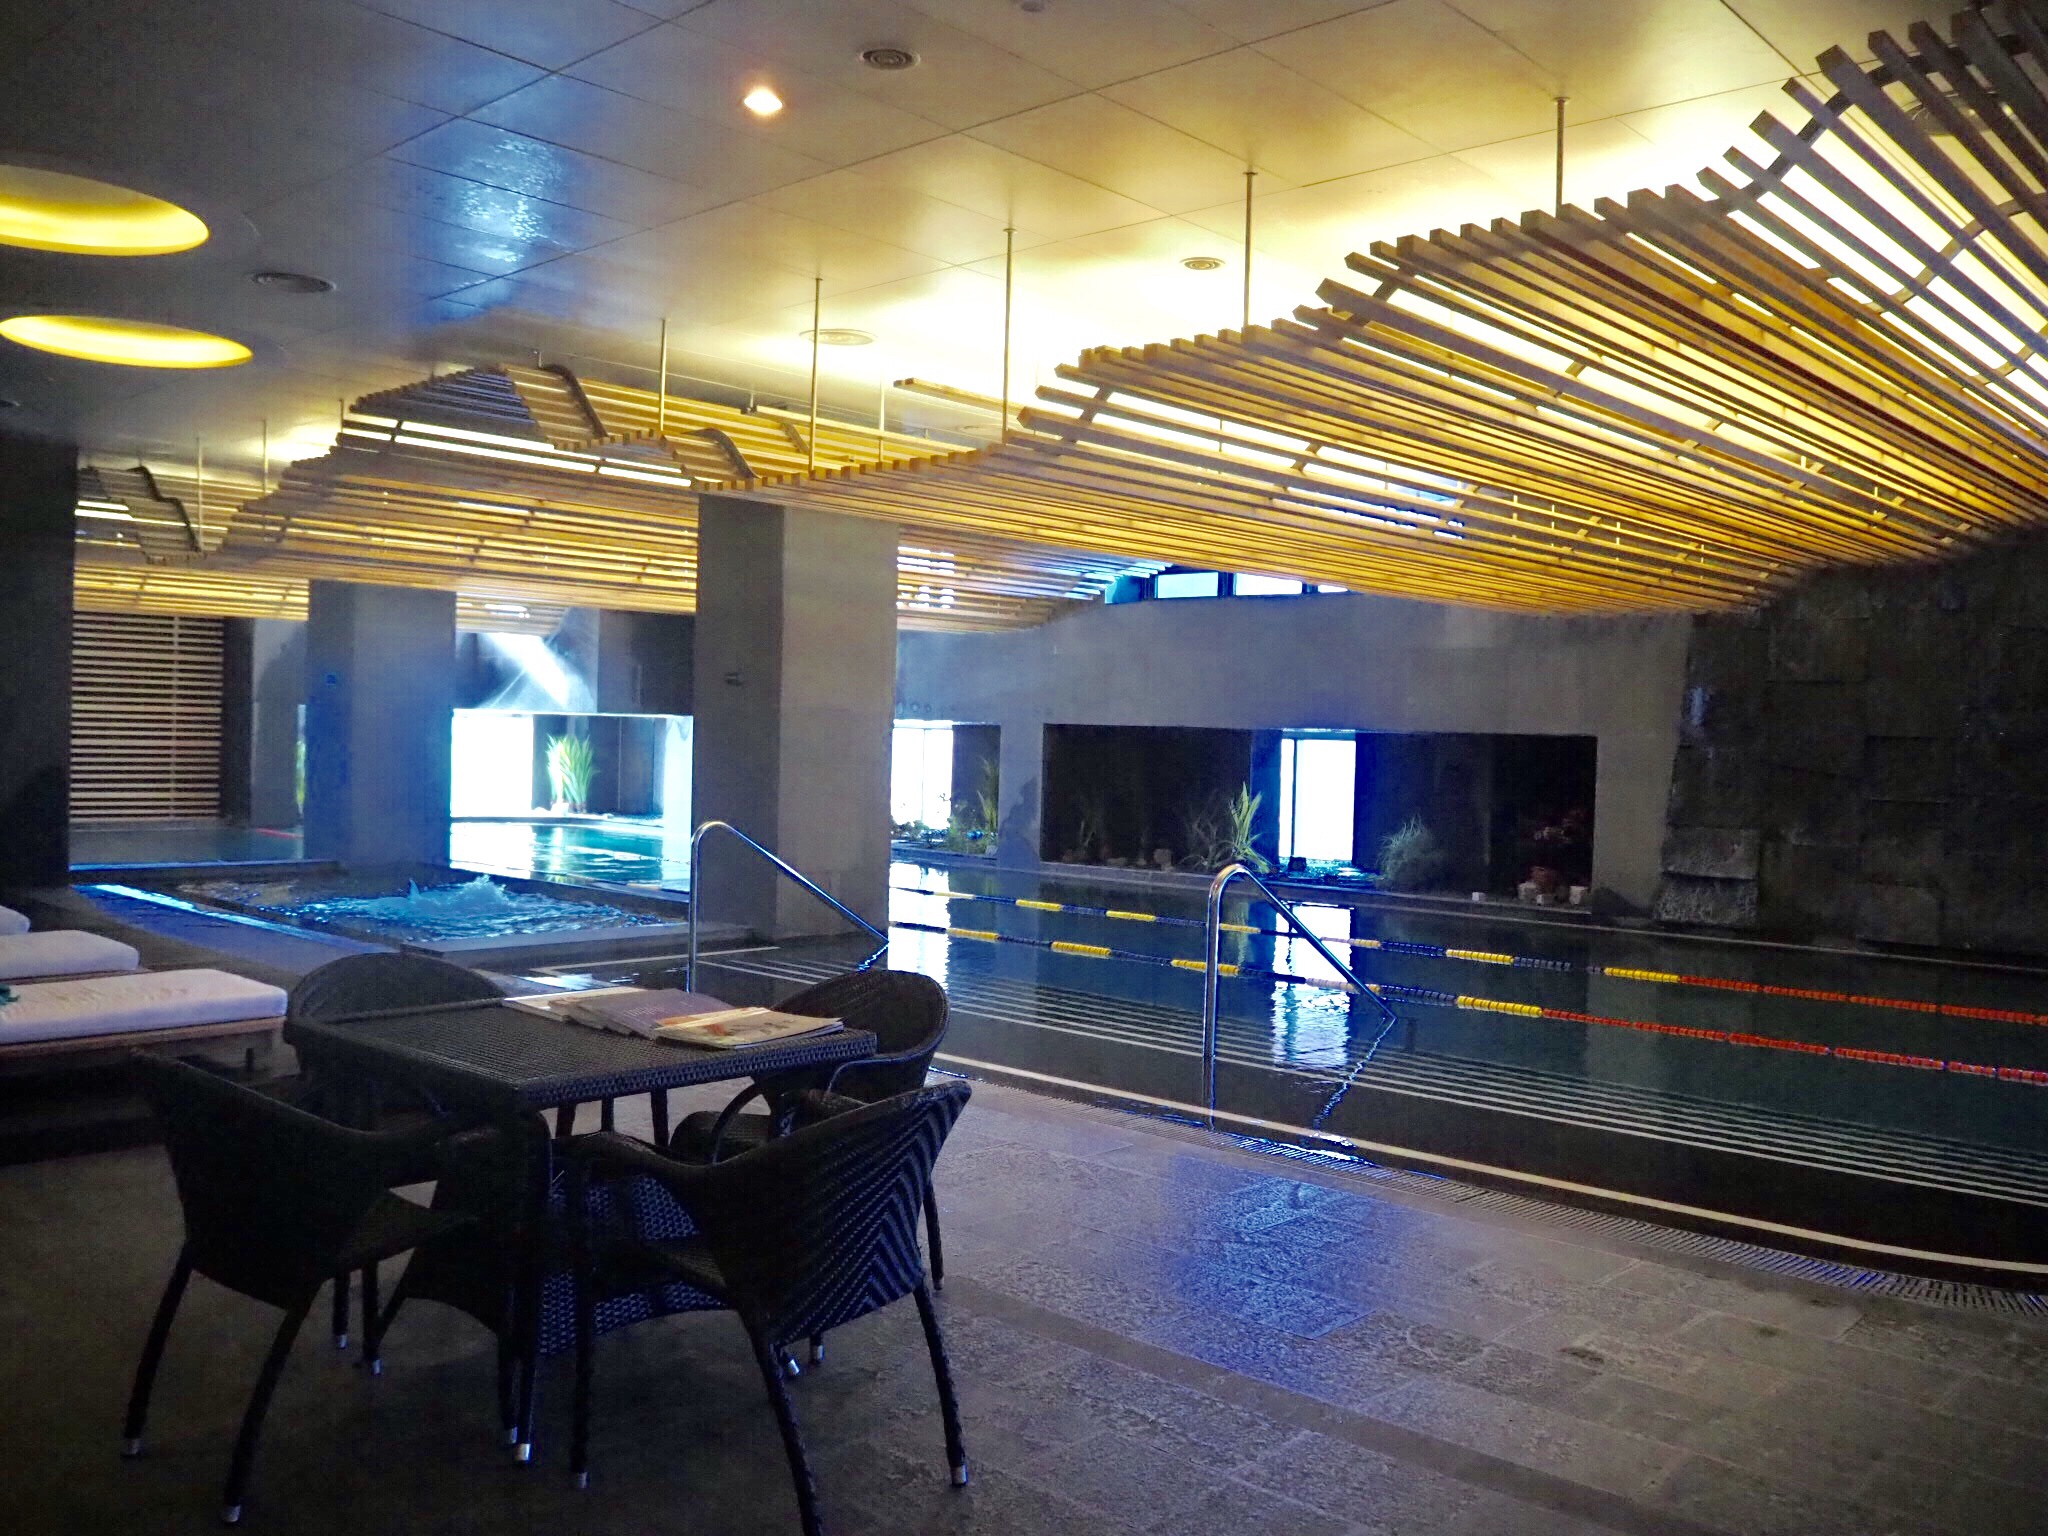 img 7816 - Banyan Tree Club & Spa Seoul - リピーターにお勧めしたい韓国ソウルのちょっと贅沢なステイ先